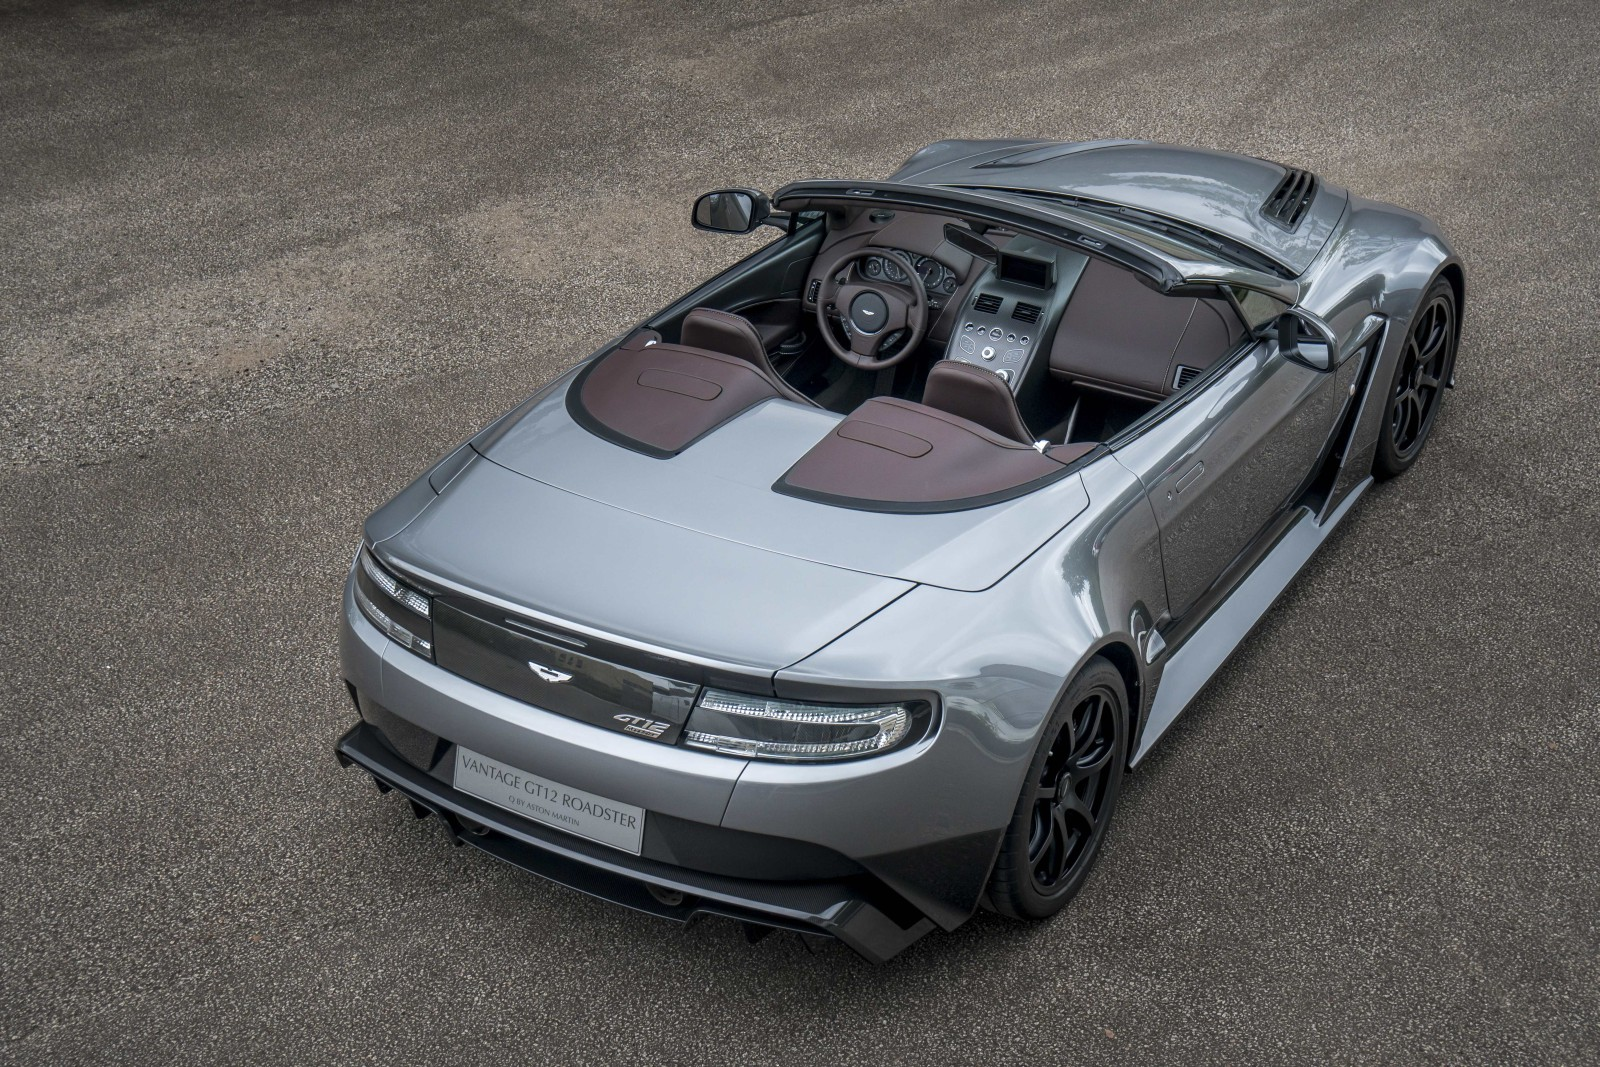 Aston Martin - Vantage GT12 Roadster (4)